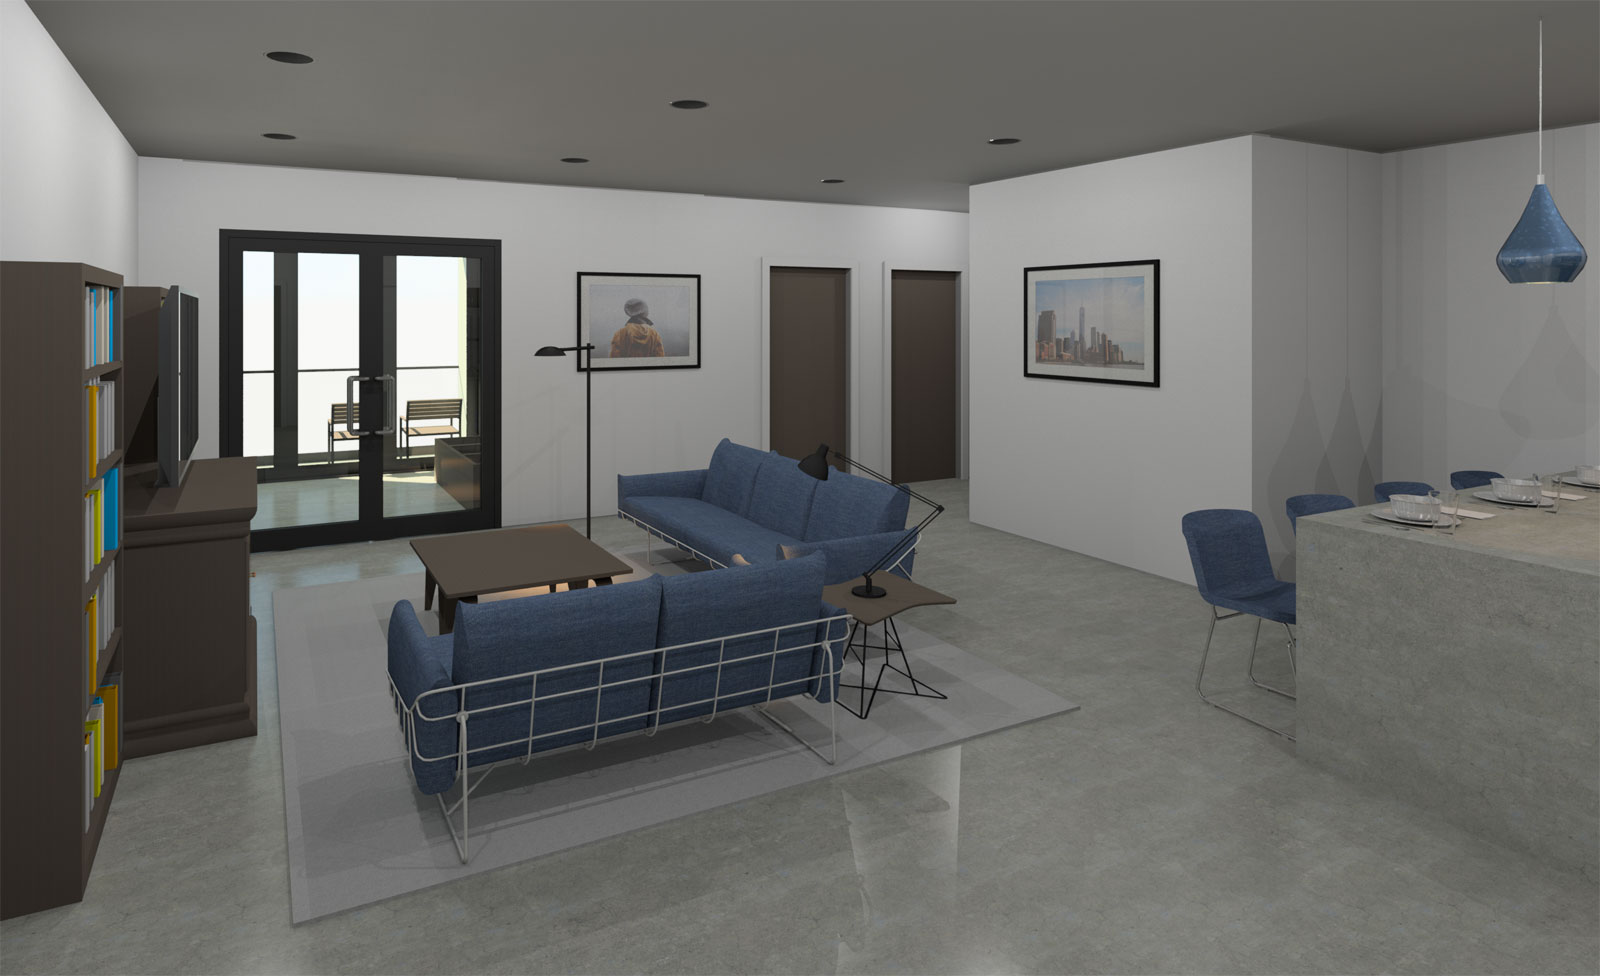 2 Bedroom Interior Initial